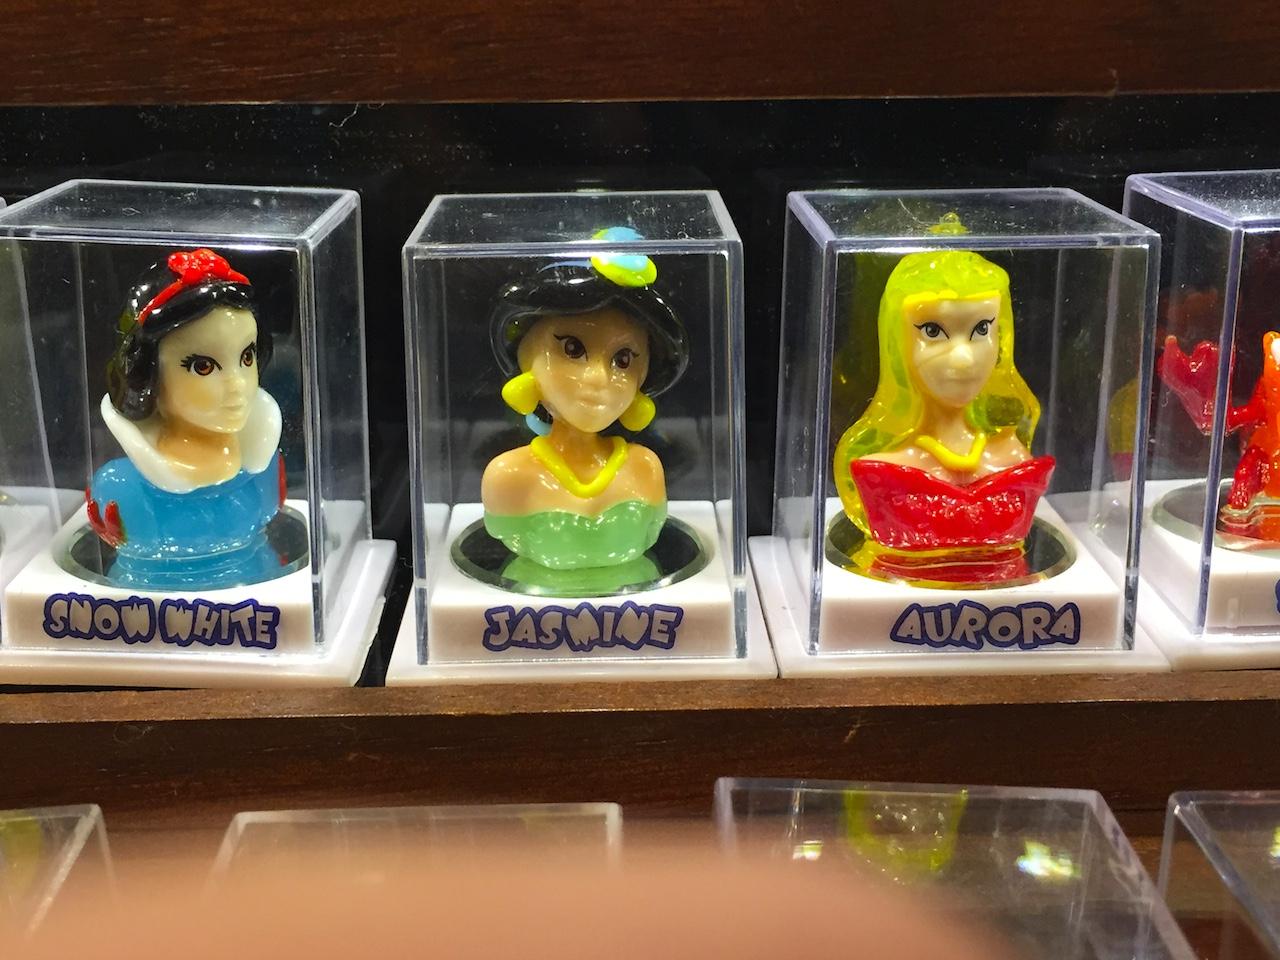 9 of the strangest souvenirs